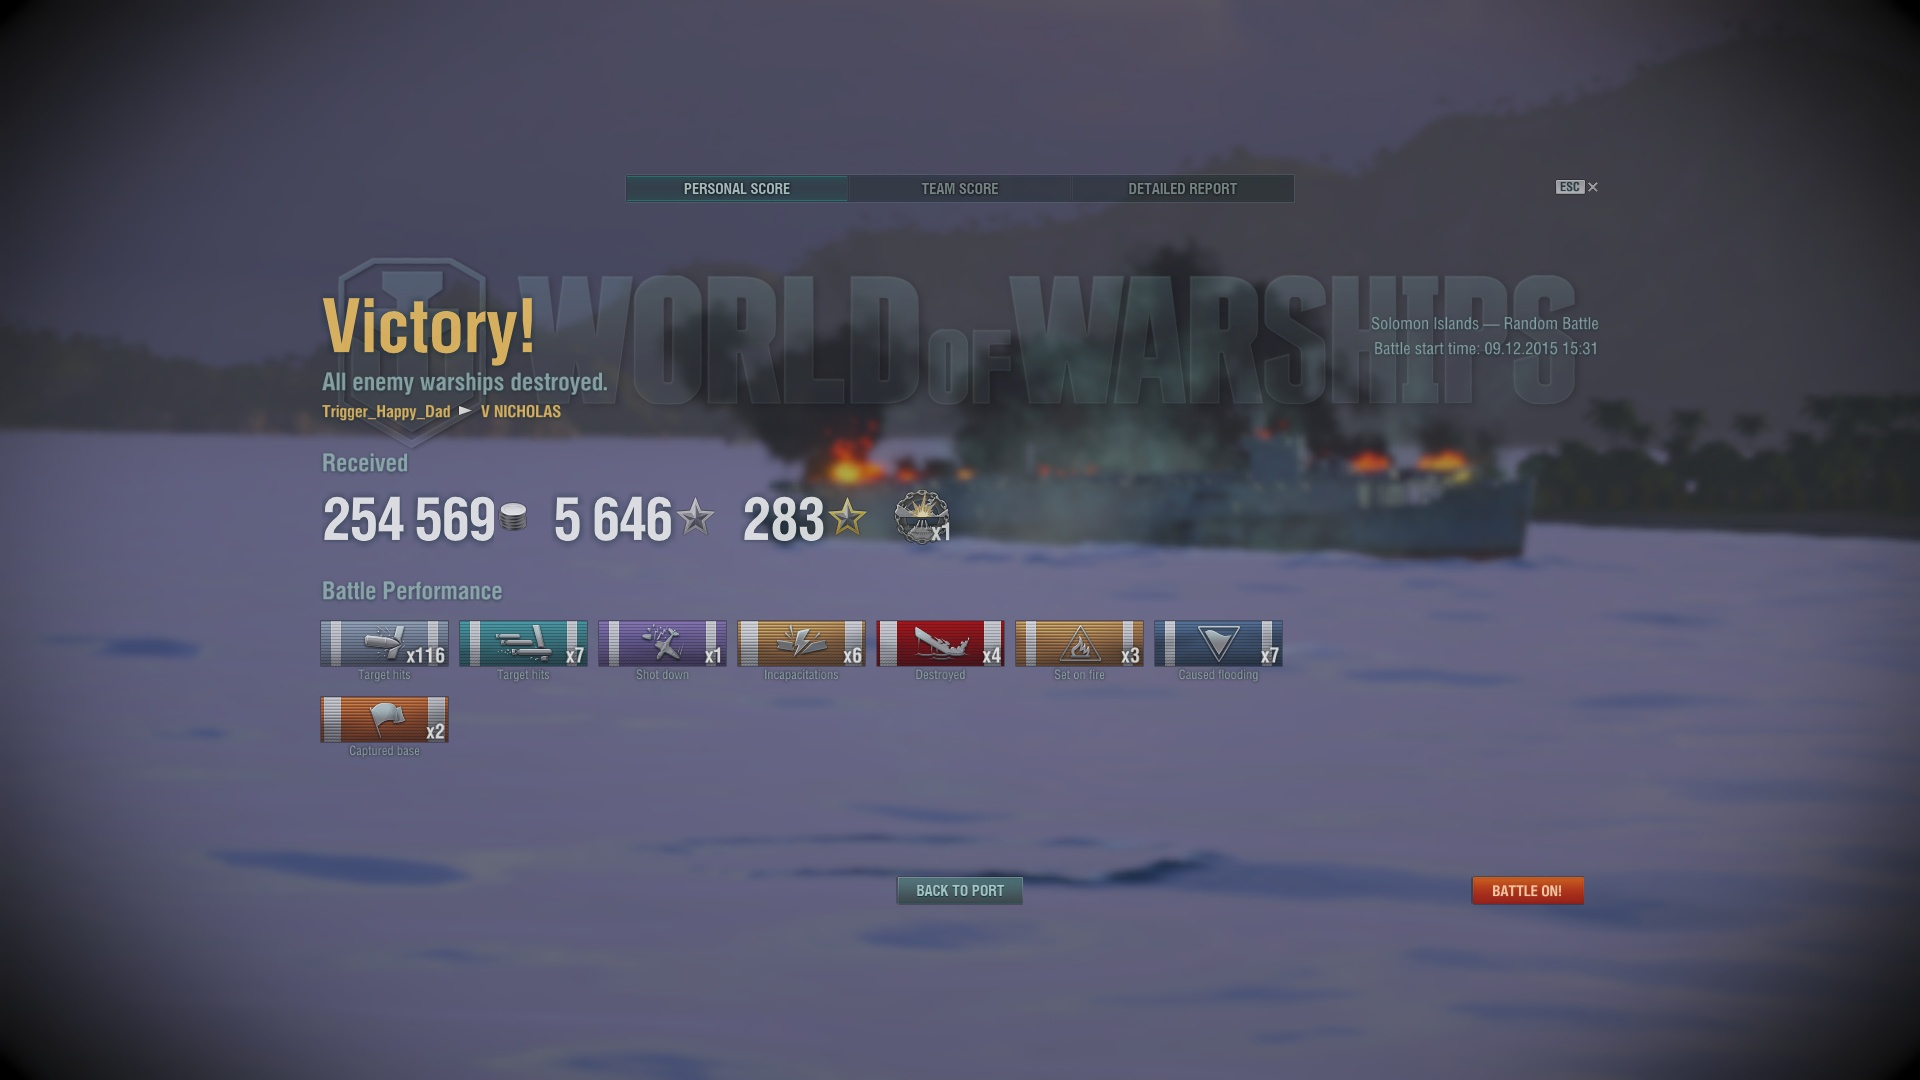 shot-15.12.09_15.47.1rkzme.jpg